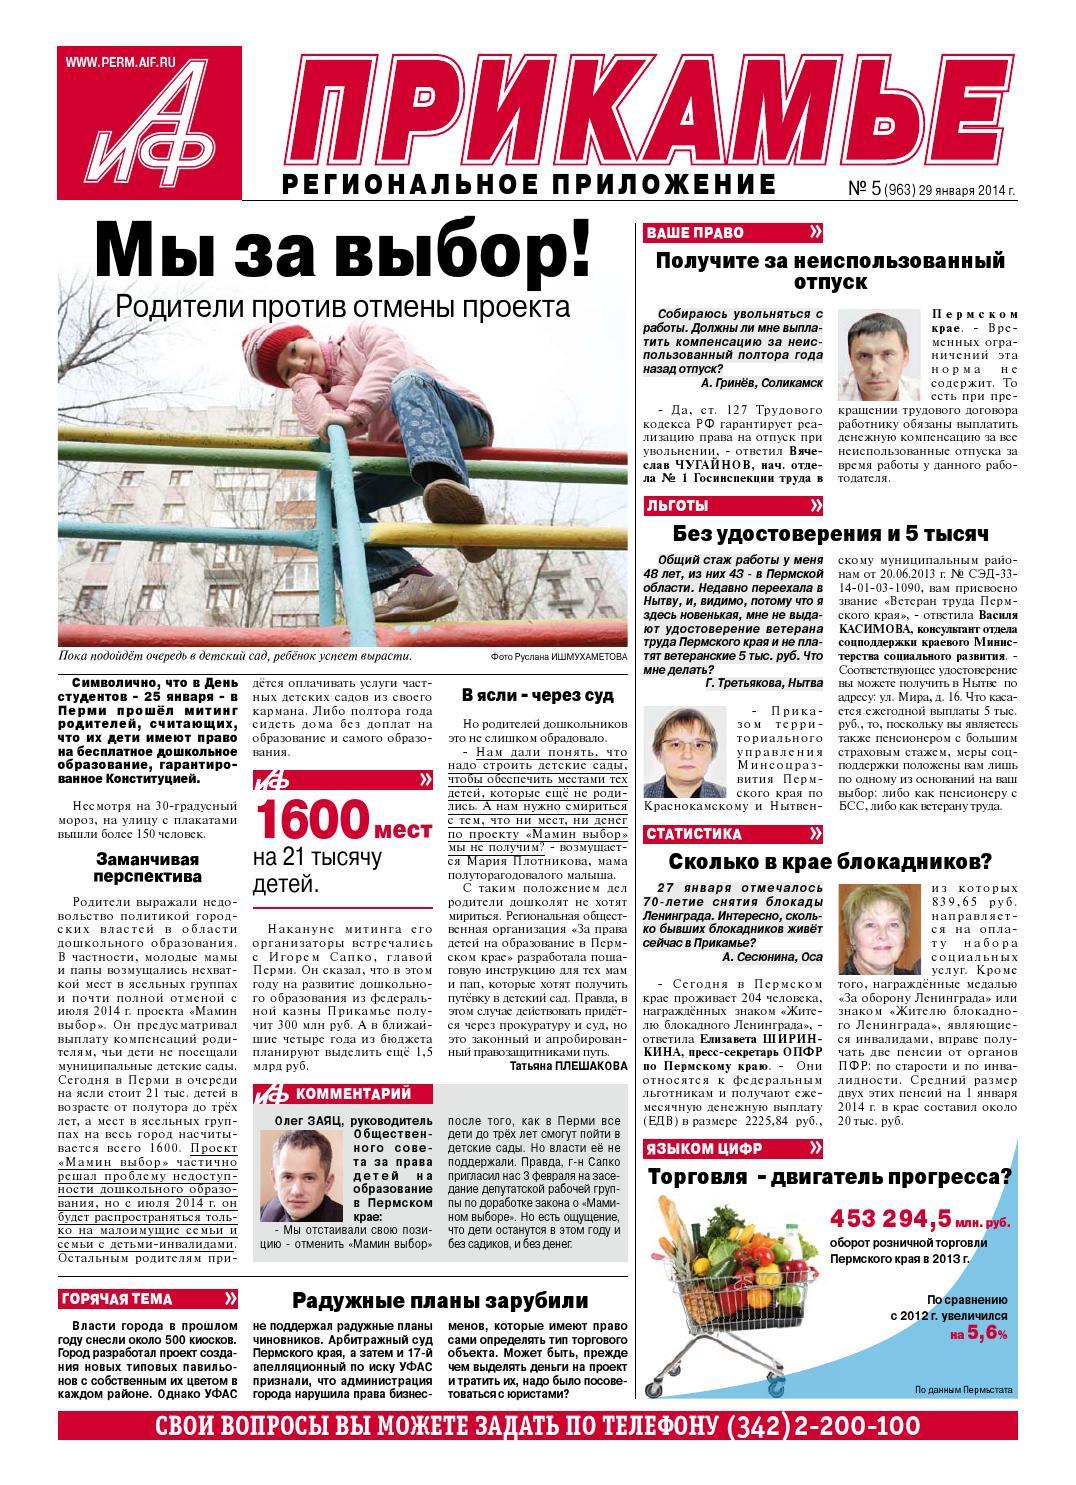 Тепловик во второй раз в сезоне громит Арсенал-Киевщину